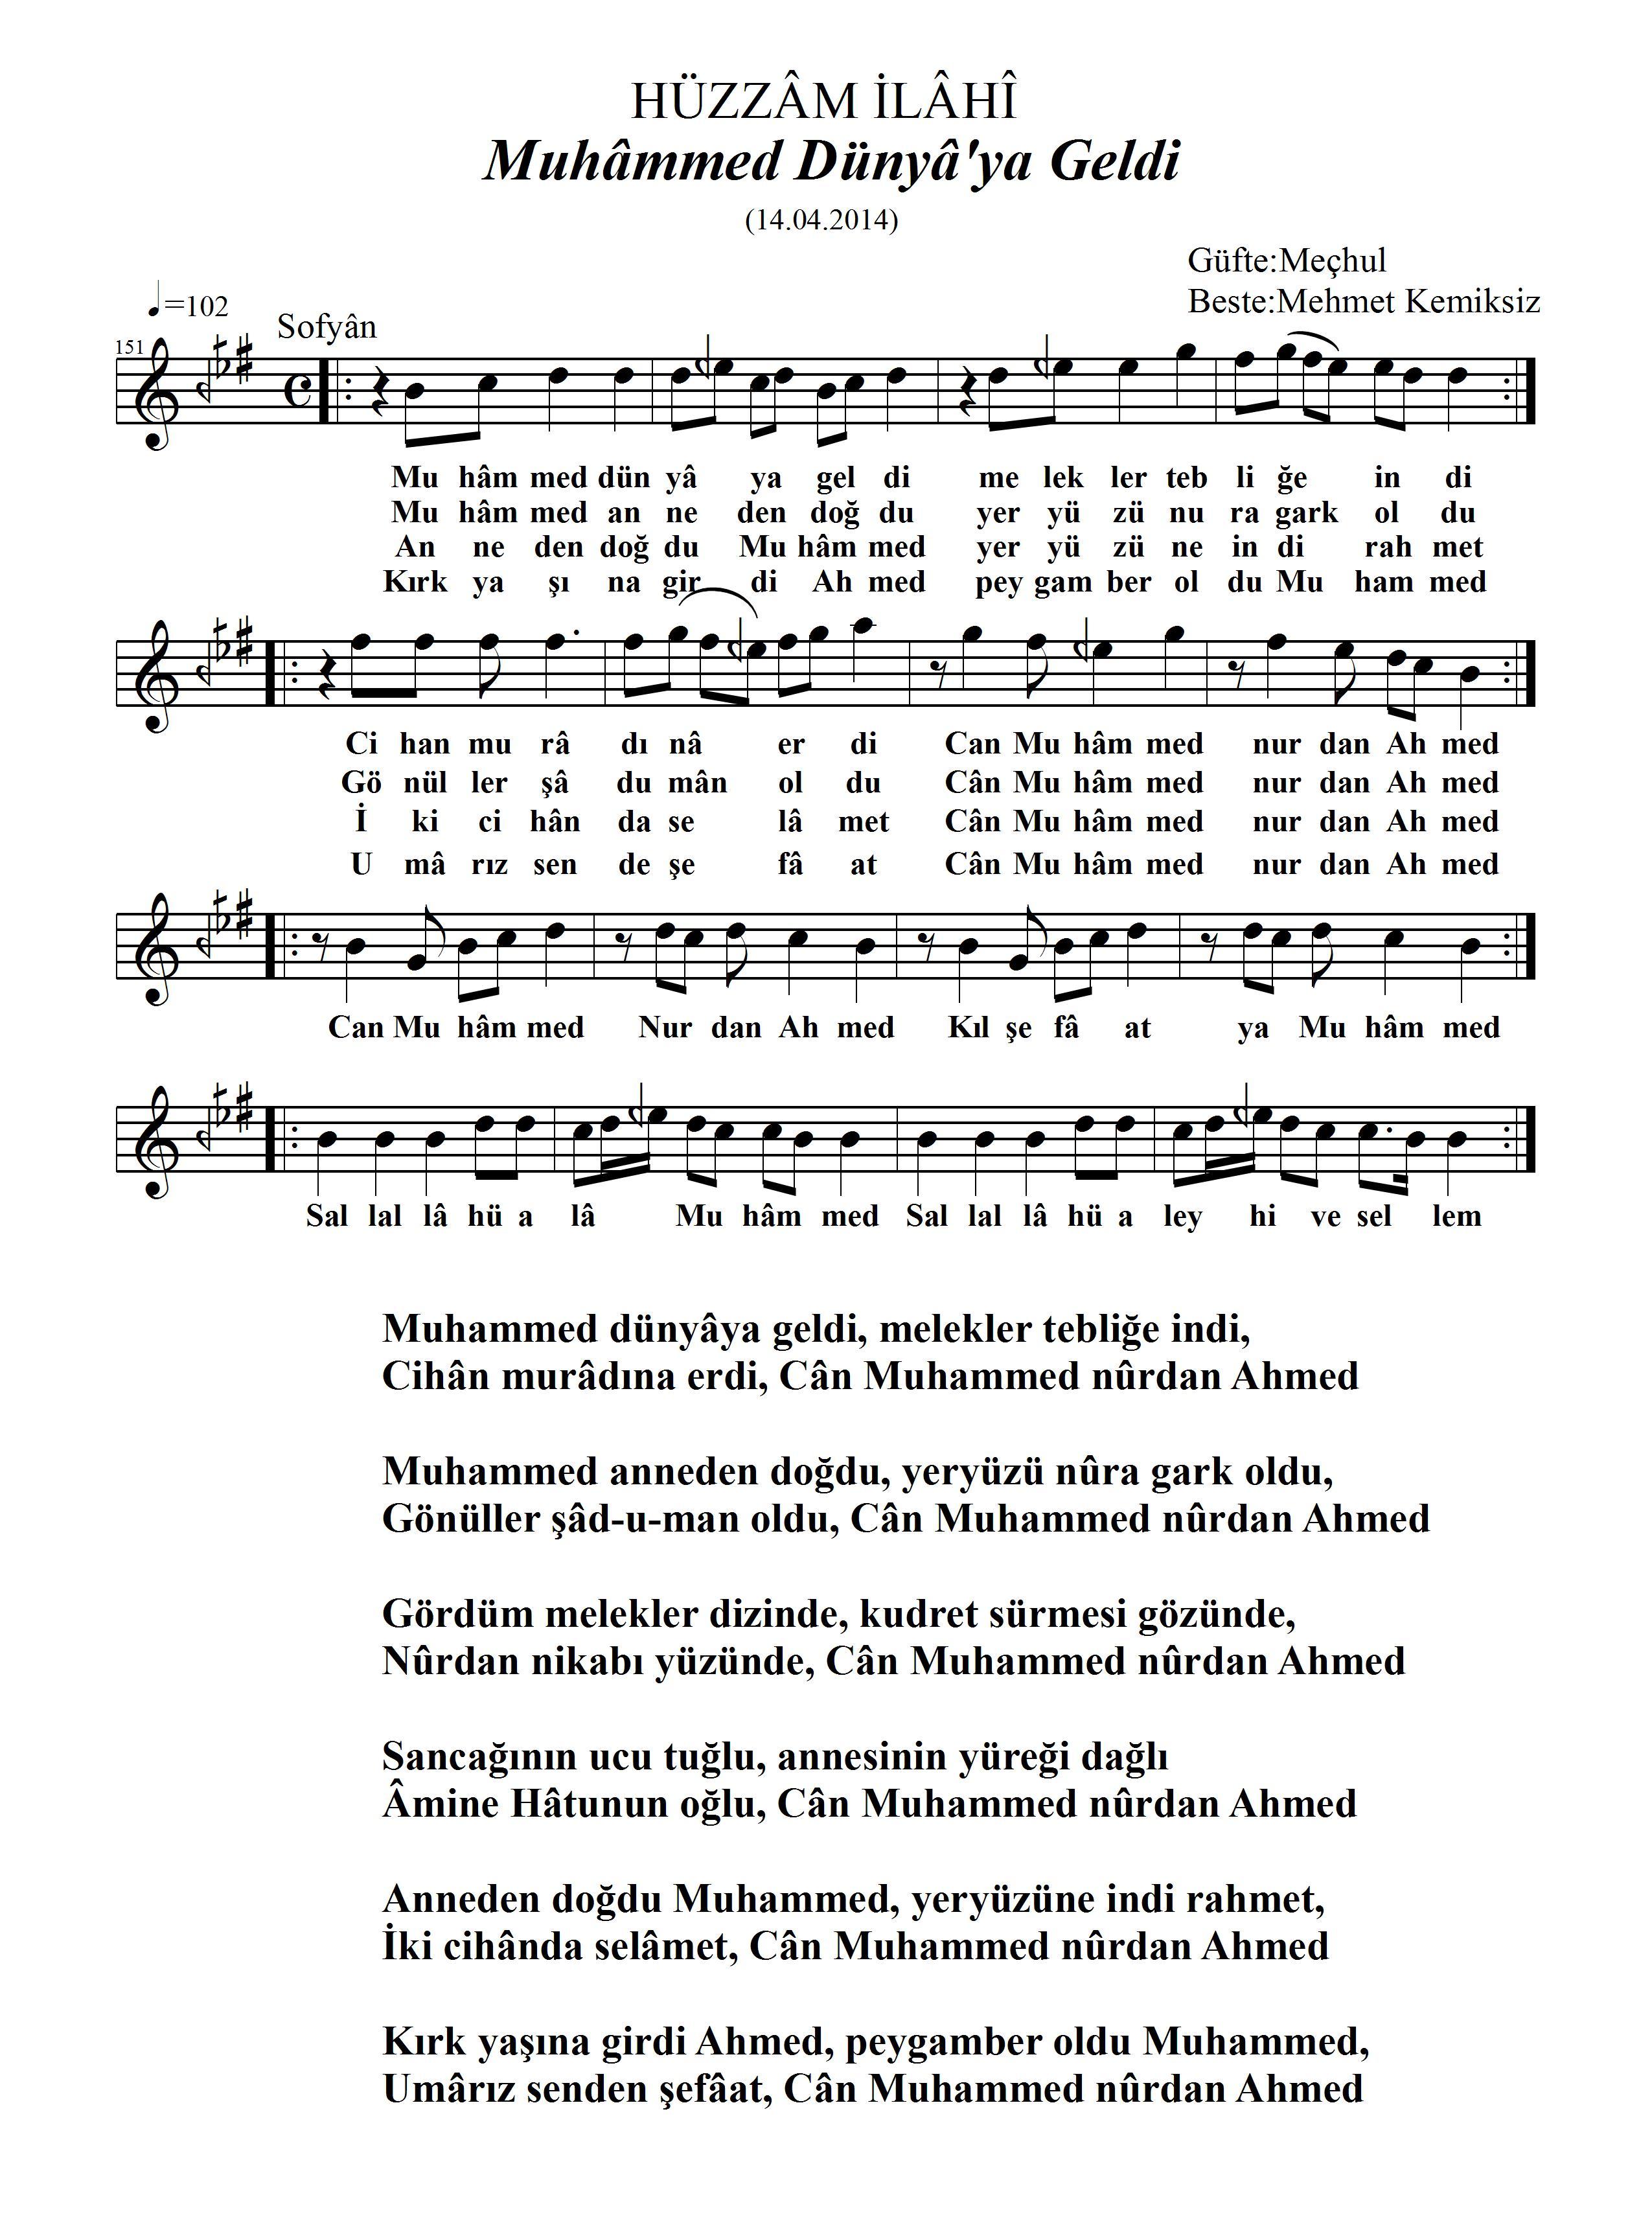 151-Huzzam- Muhammed Dunyaya